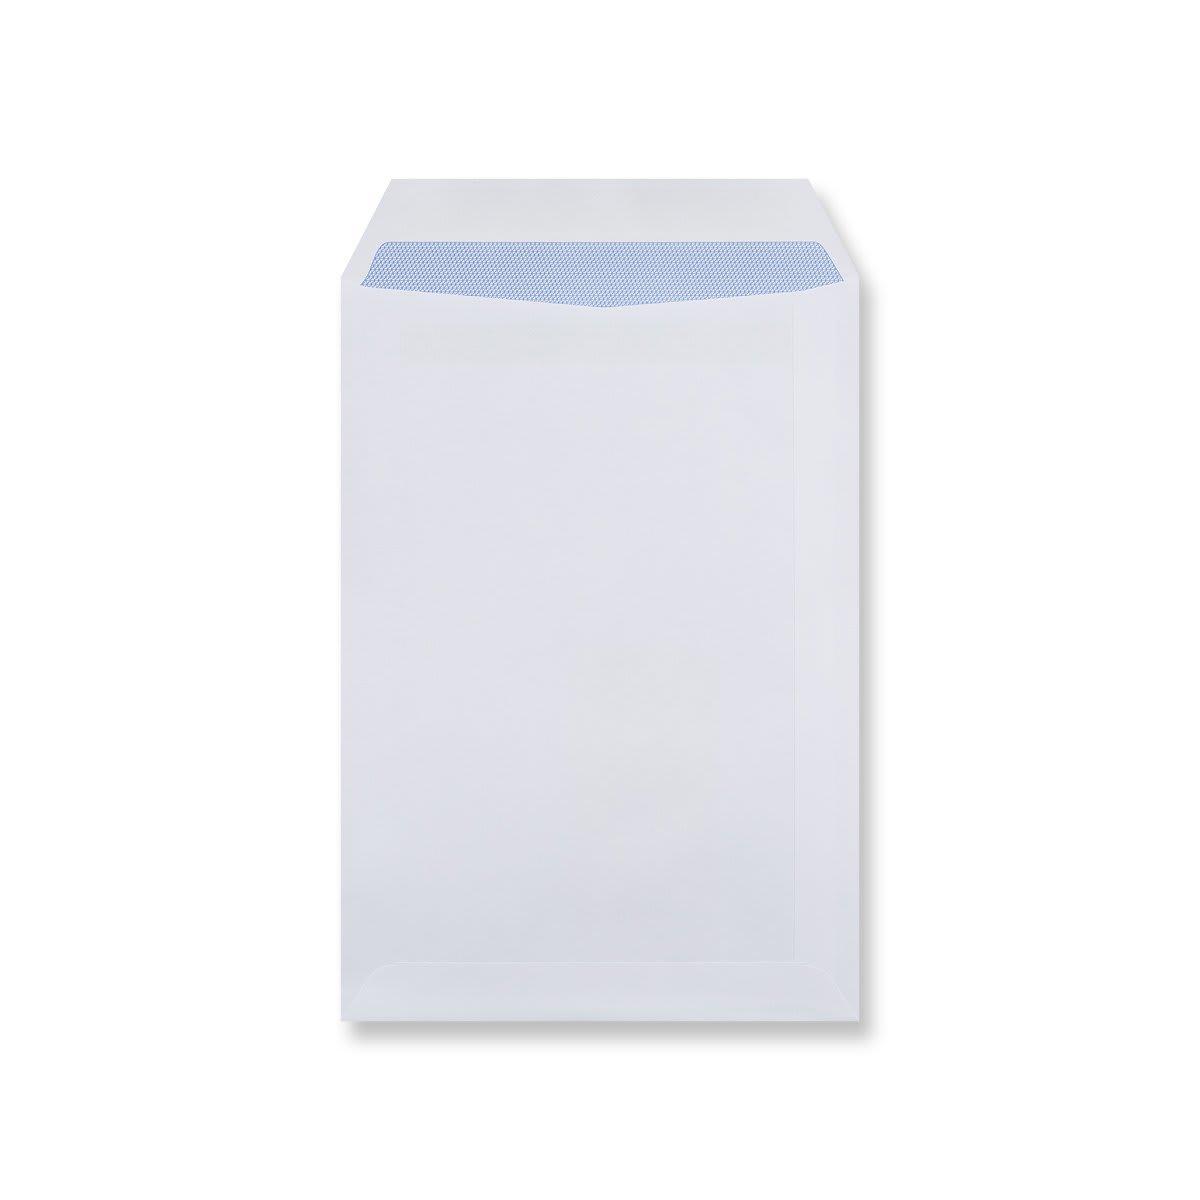 C5 WHITE SELF SEAL POCKET WINDOW ENVELOPES 90GSM